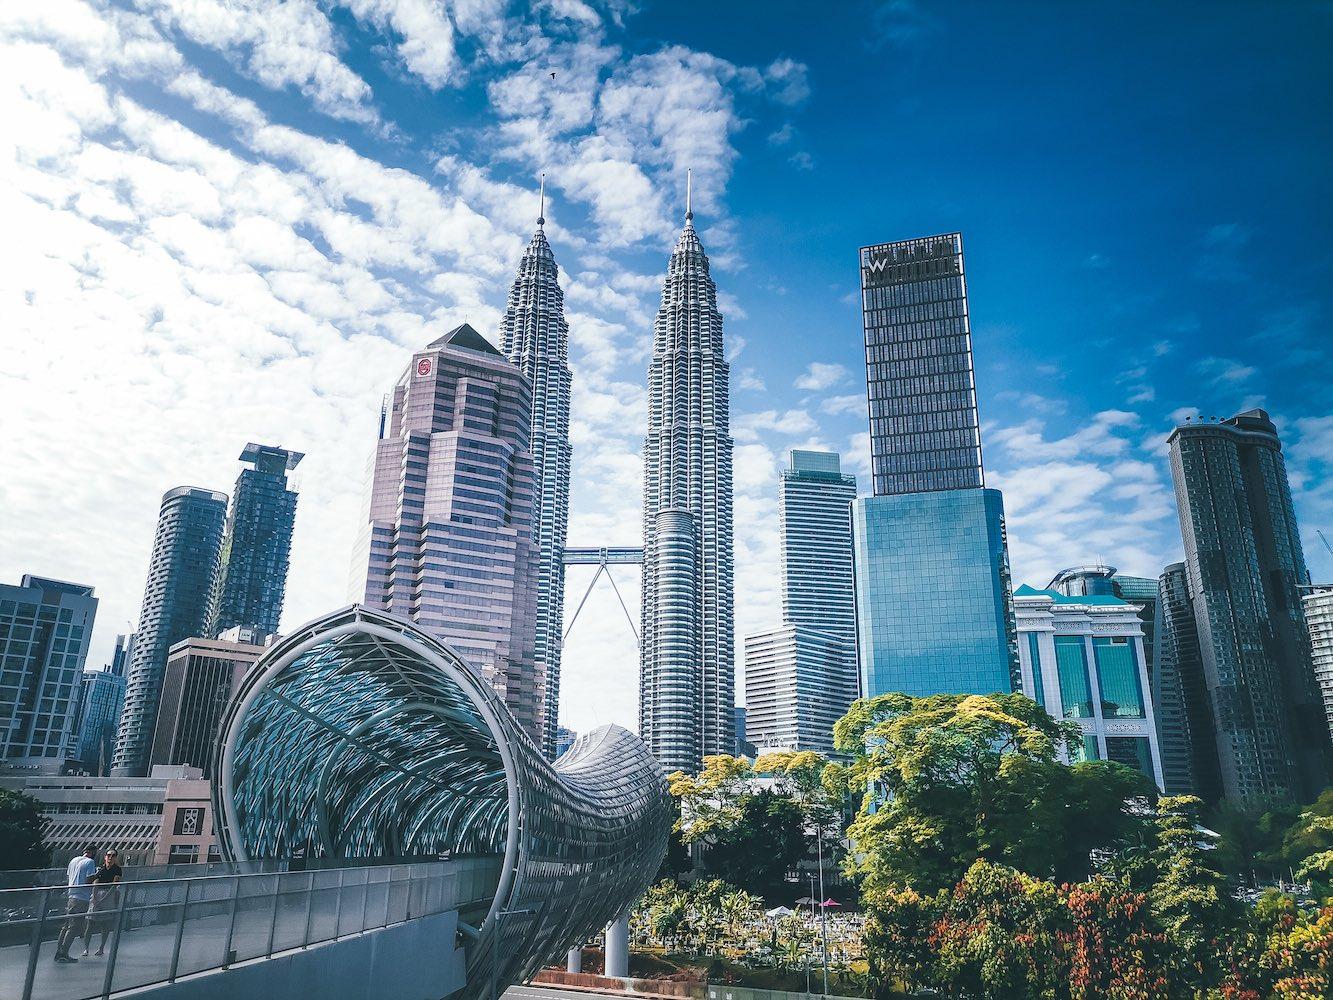 Kualu Lumpur skyline